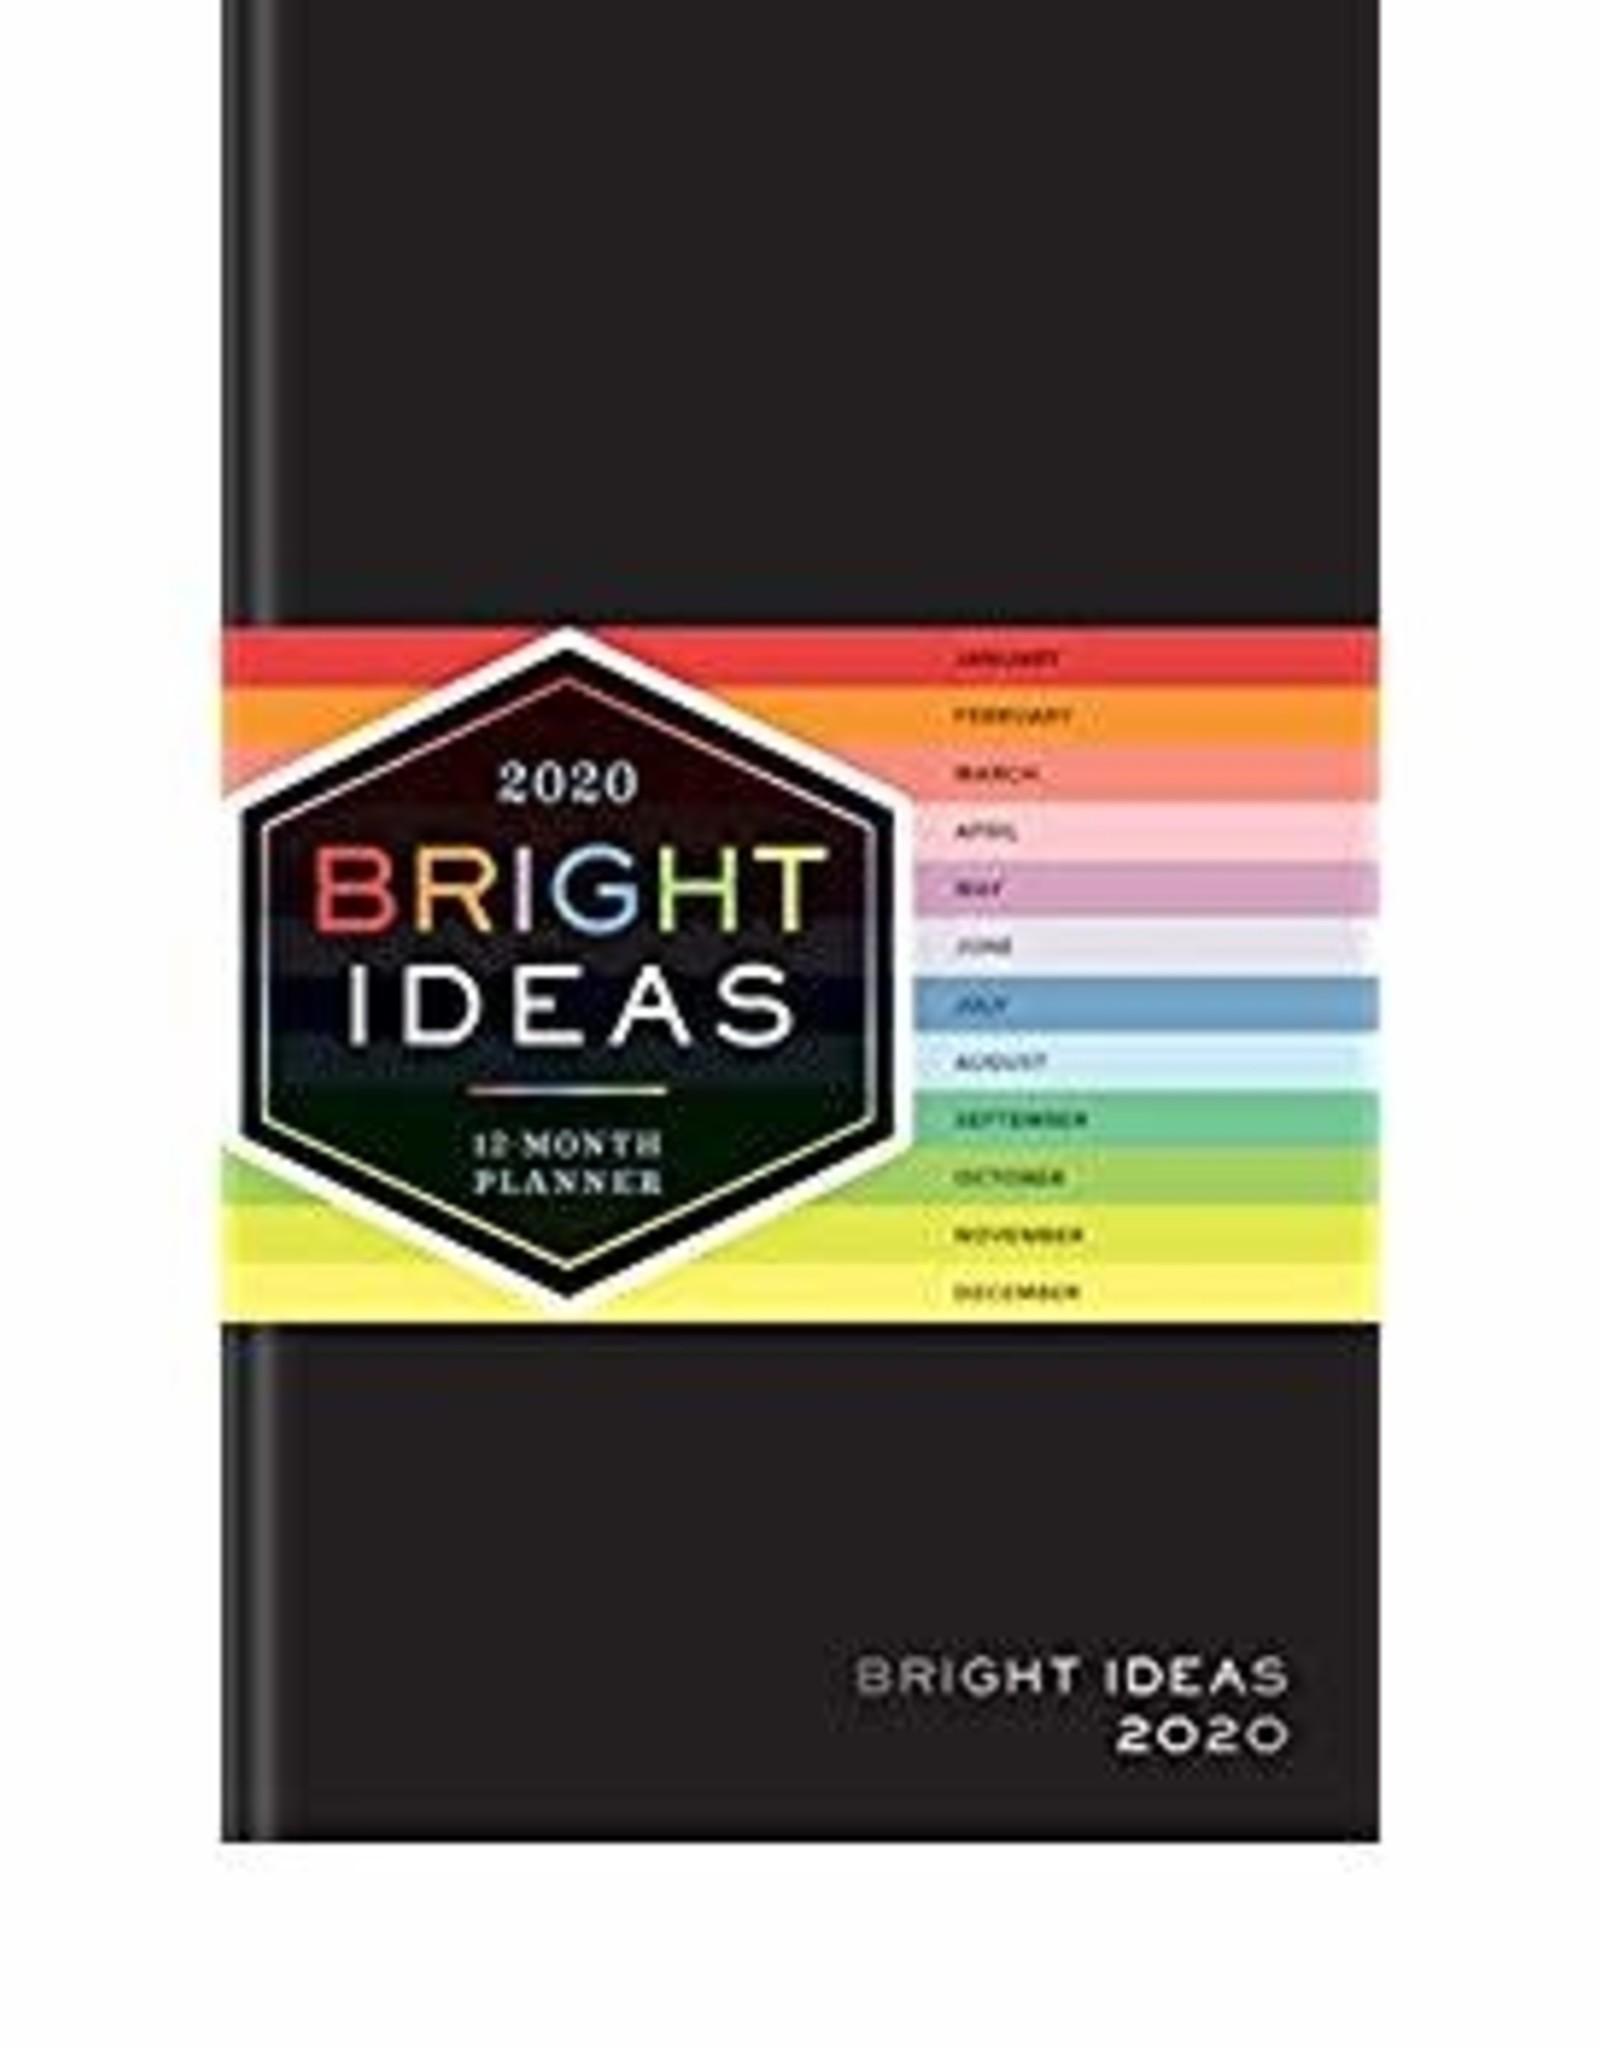 Bright Ideas 2020 Planner